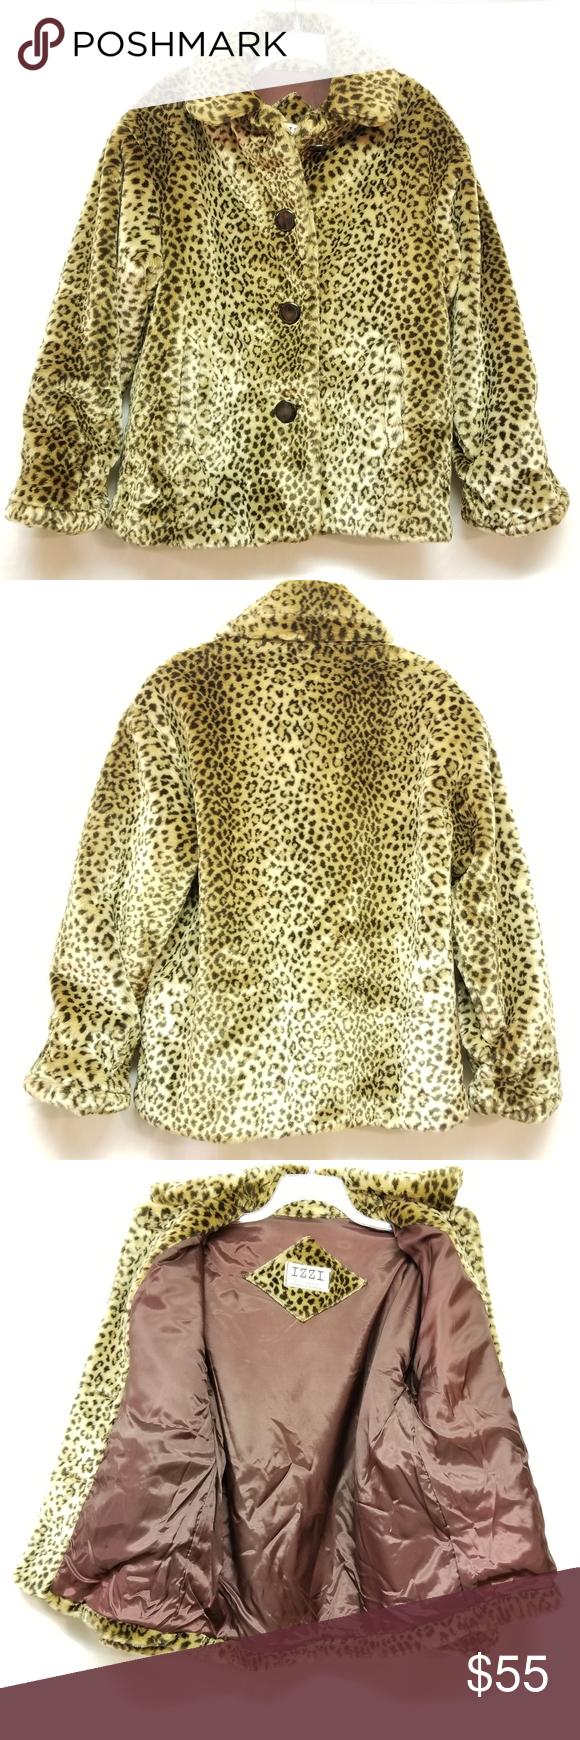 Izzi Outerwear Leapord Print Coat Print Coat Clothes Design Fashion [ 1740 x 580 Pixel ]